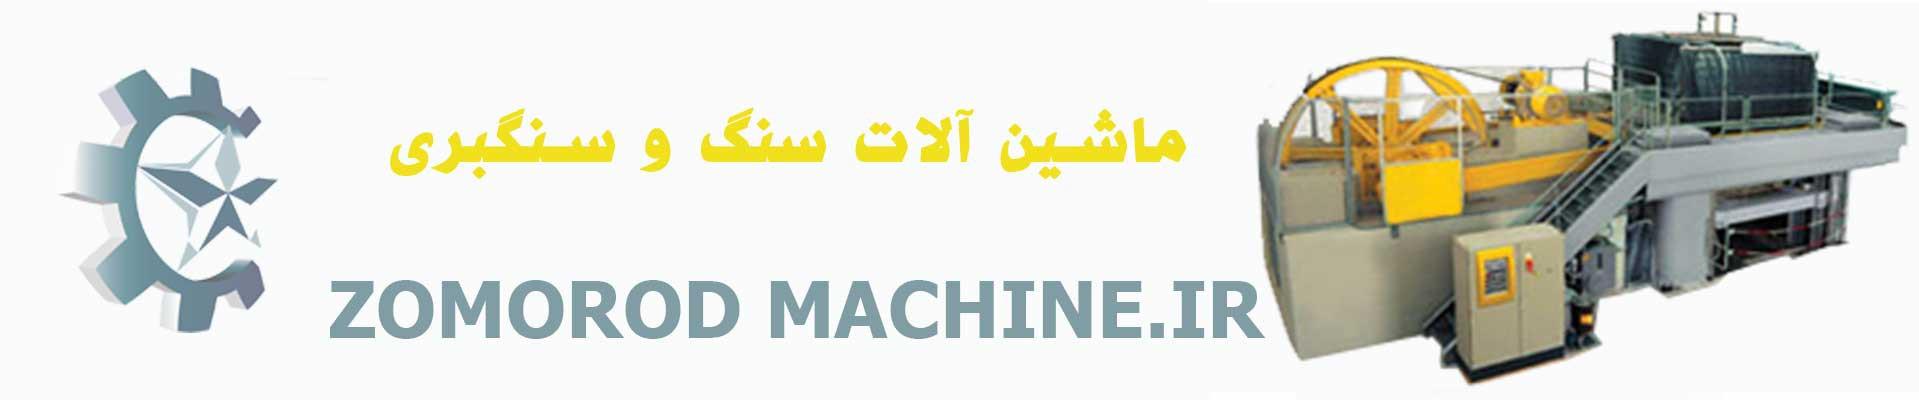 ماشین سازی و ماشین آلات جی سنگ